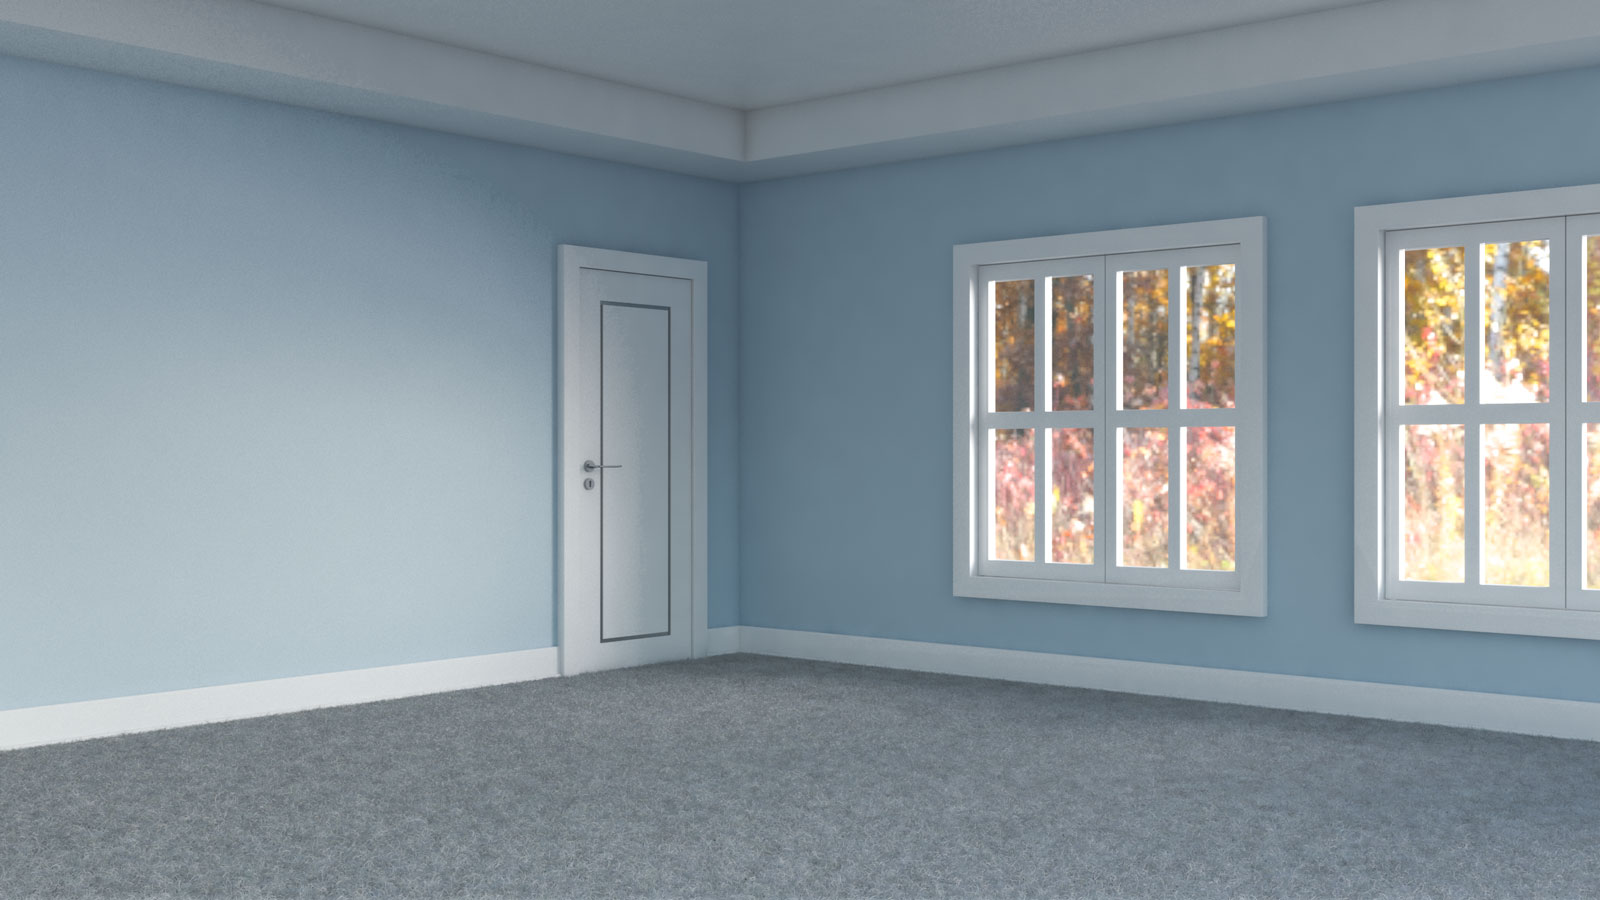 Light gray carpet with light blue walls